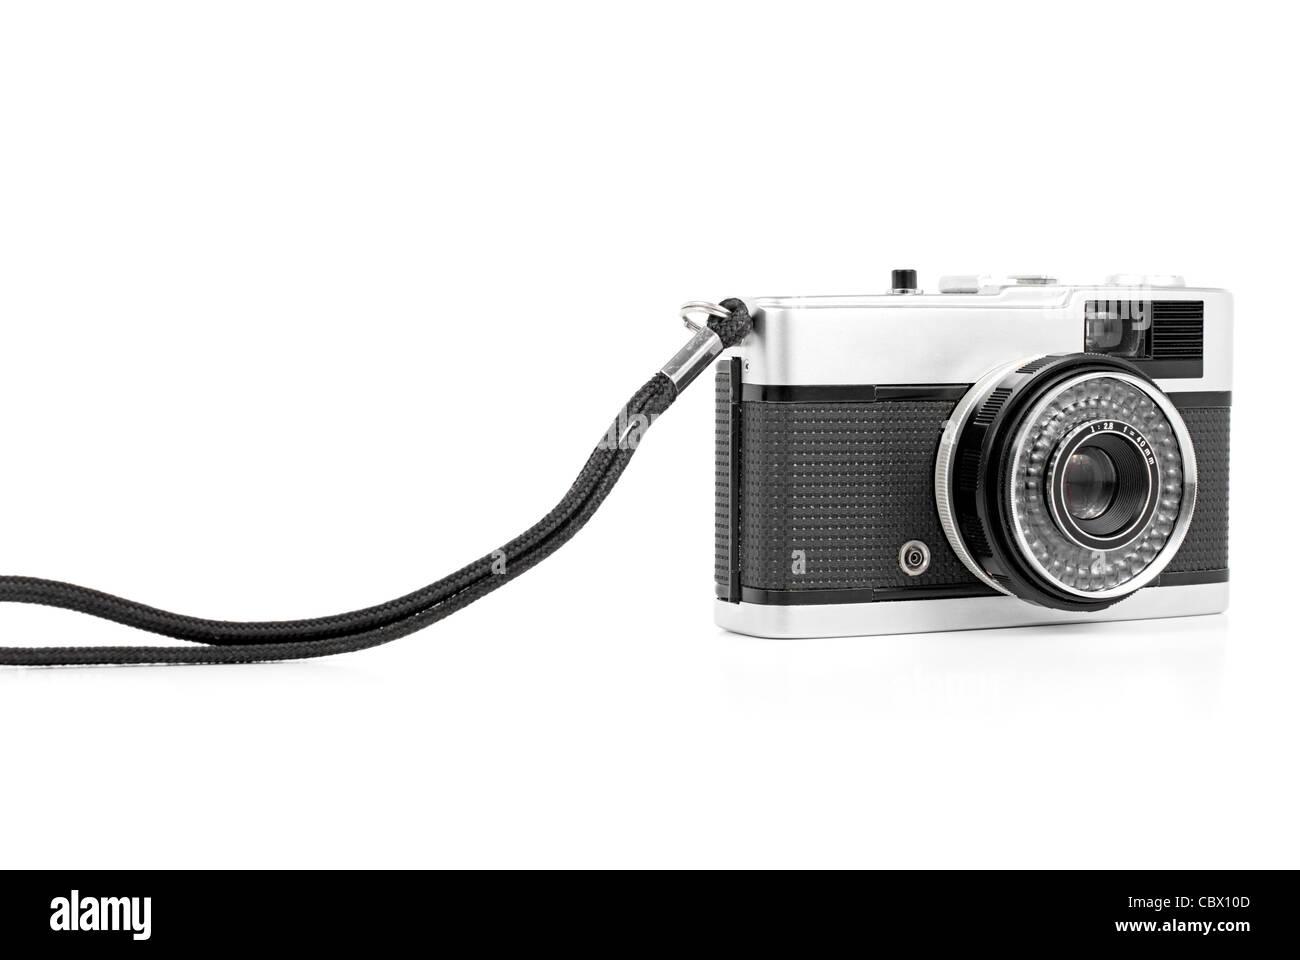 1970's pocket camera - Stock Image